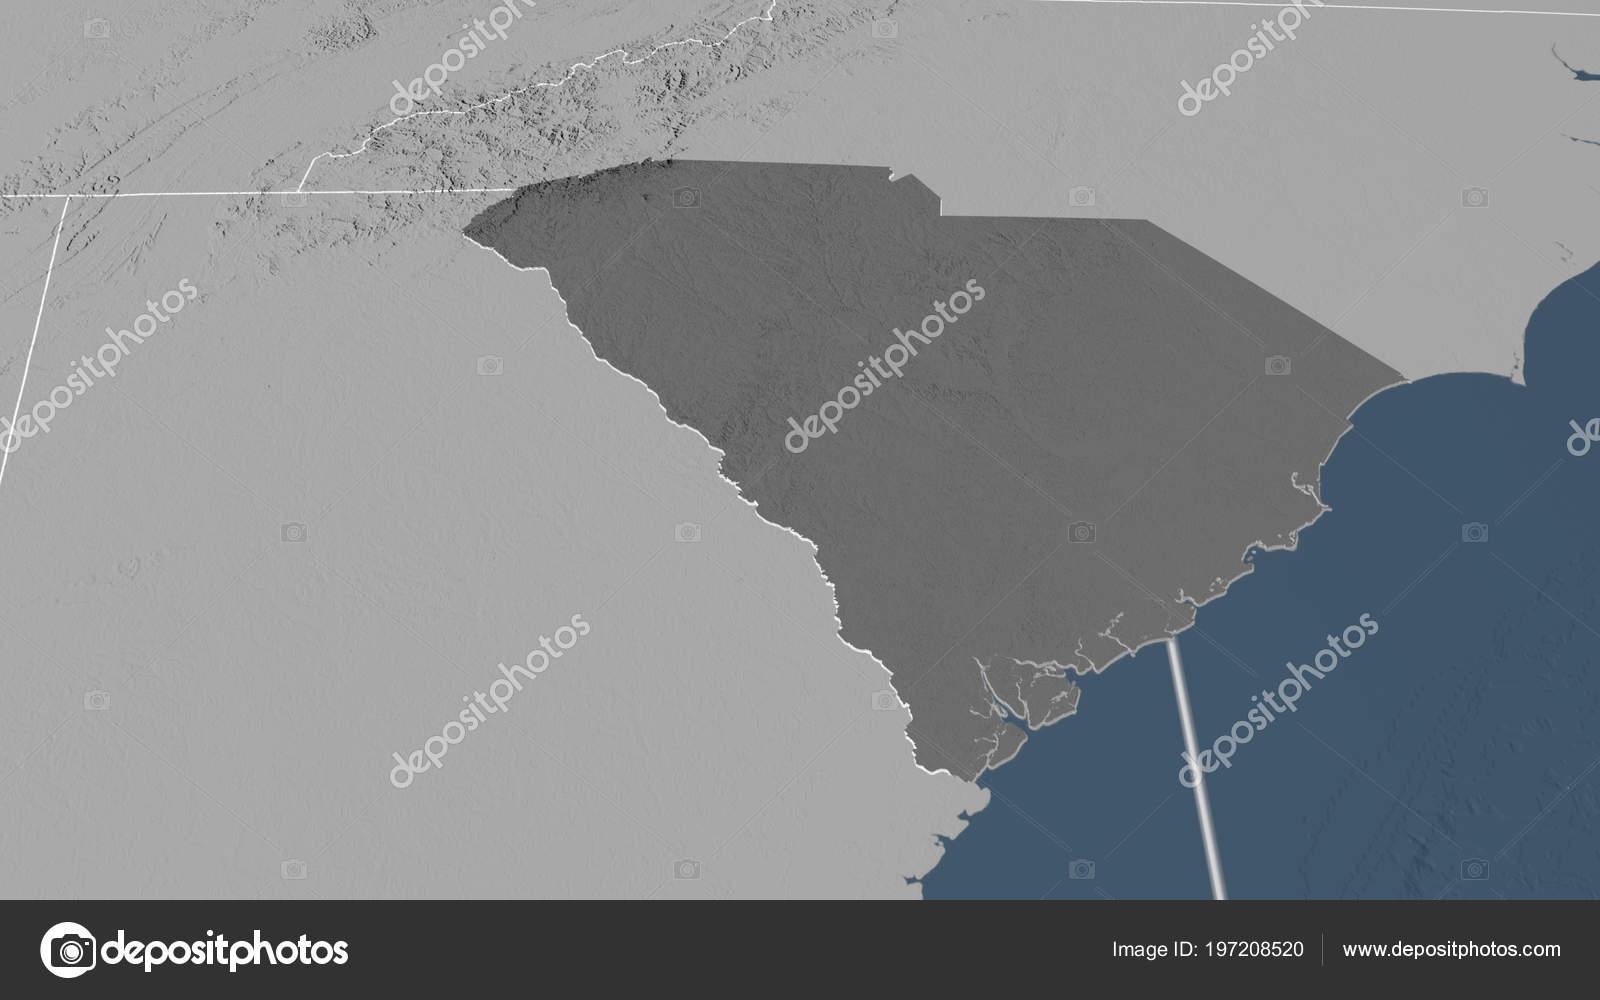 South Carolina Region United States Outlined Bilevel Elevation Map ...